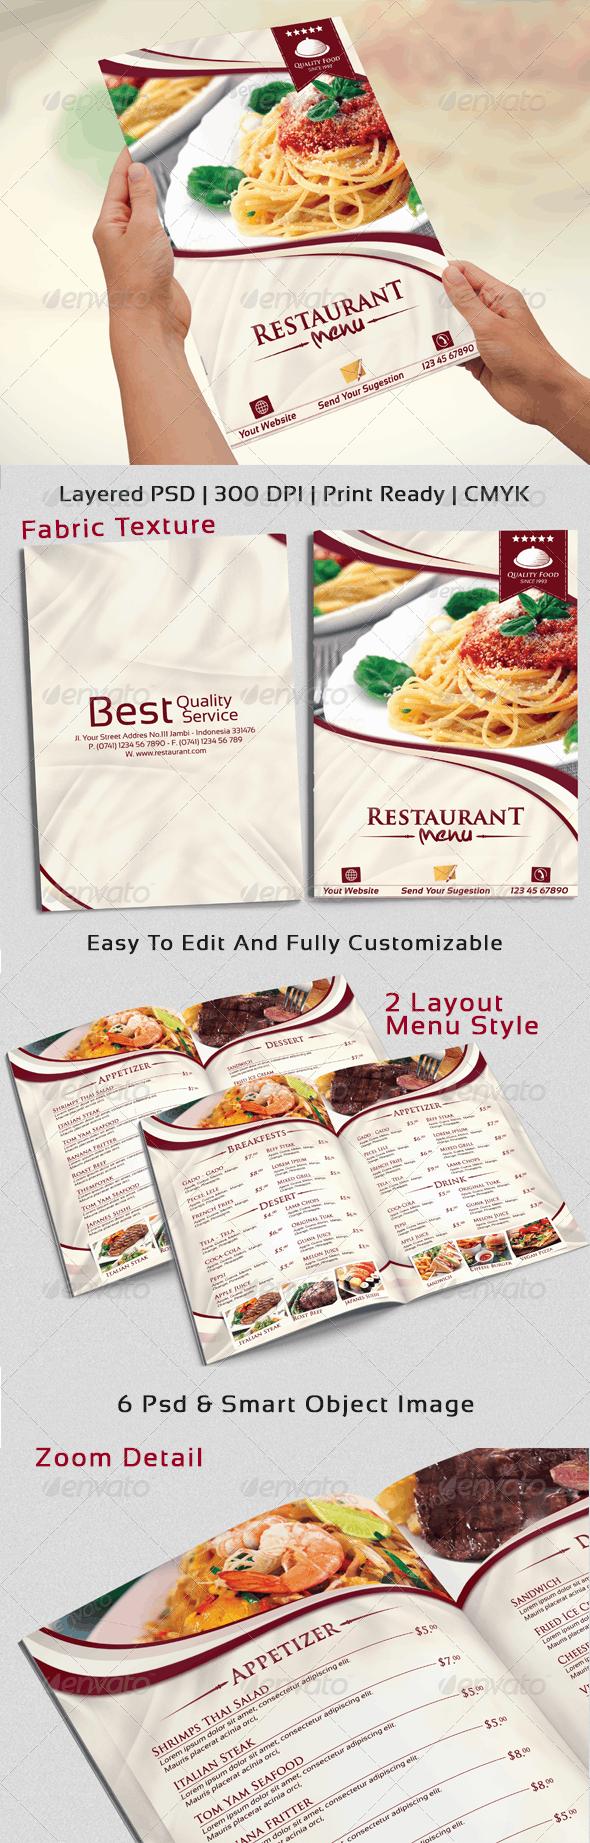 Modern & Elegant Restaurant Menu Templates  - Food Menus Print Templates